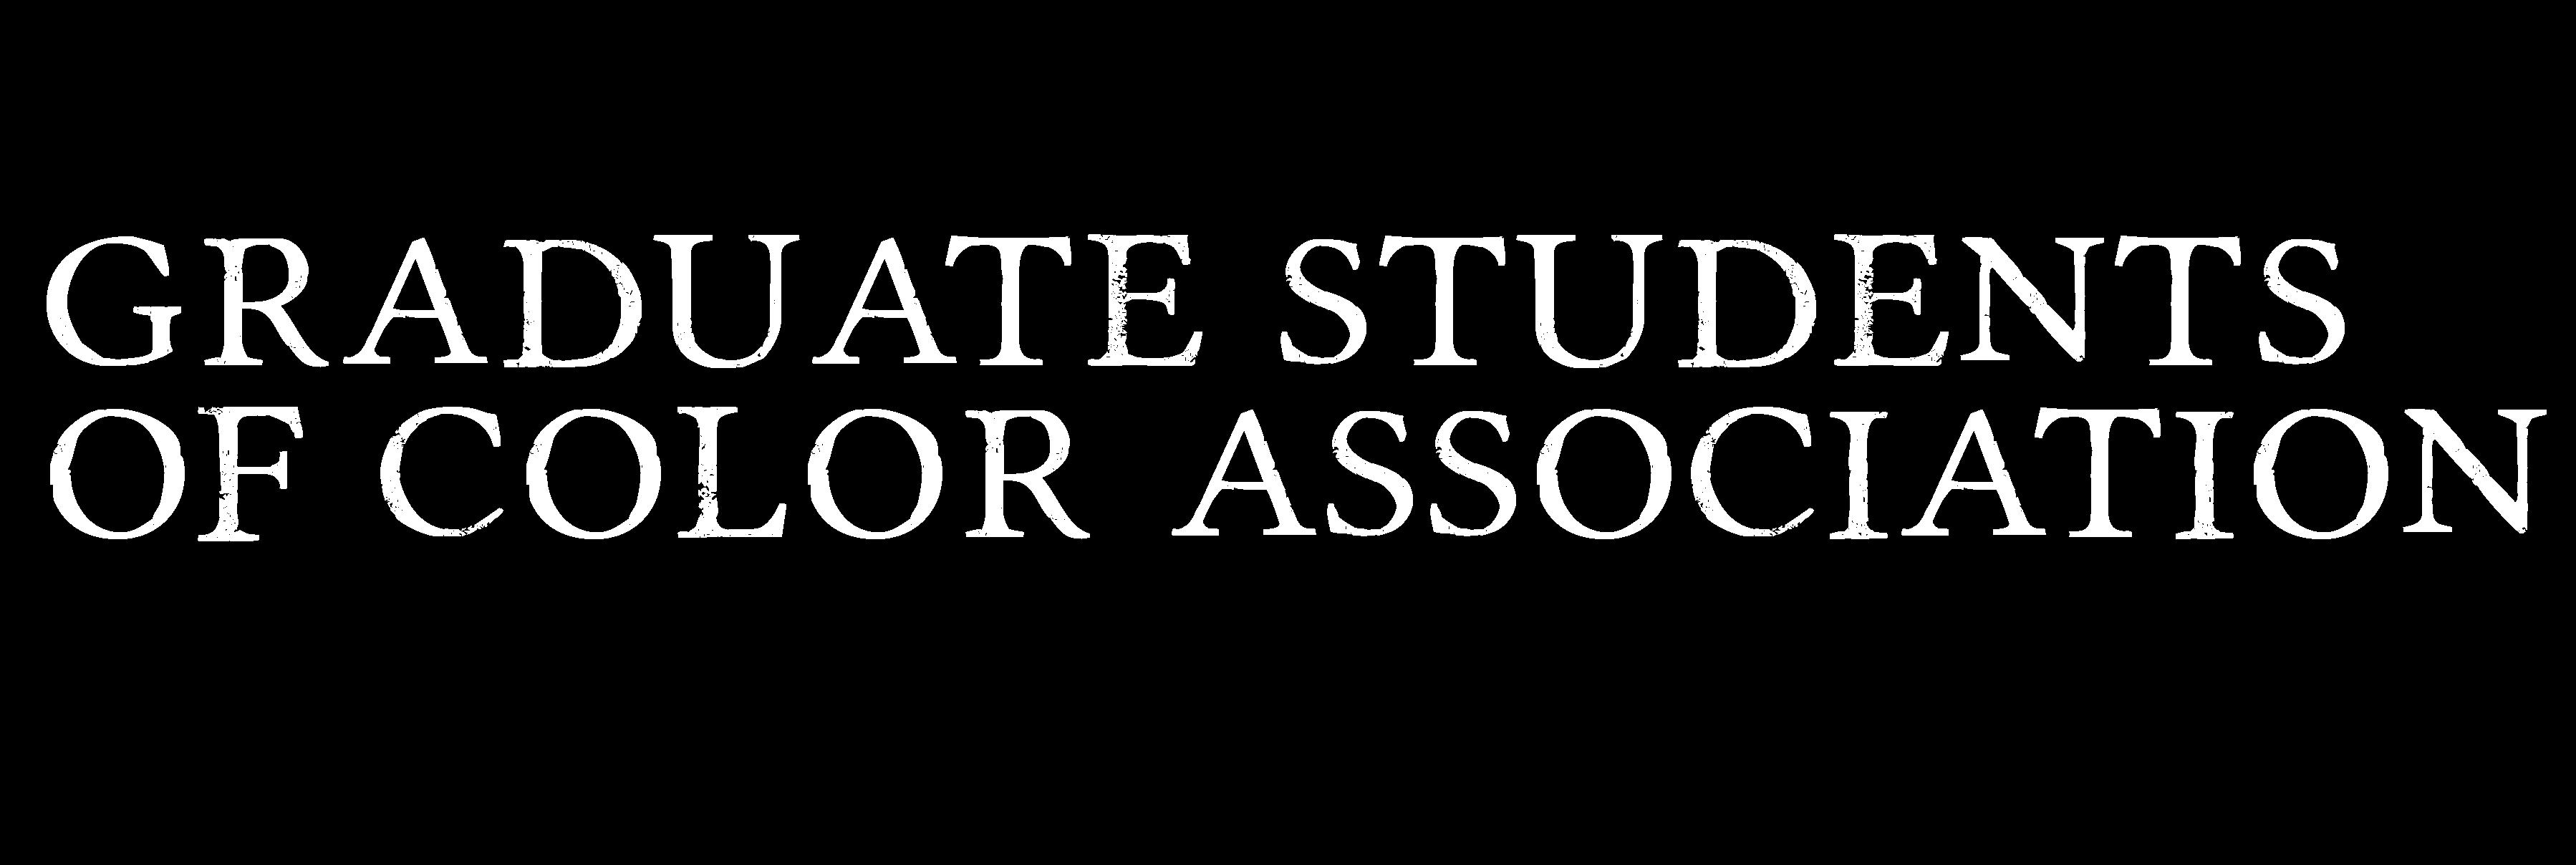 Graduate Students of Color Association (GSCA)